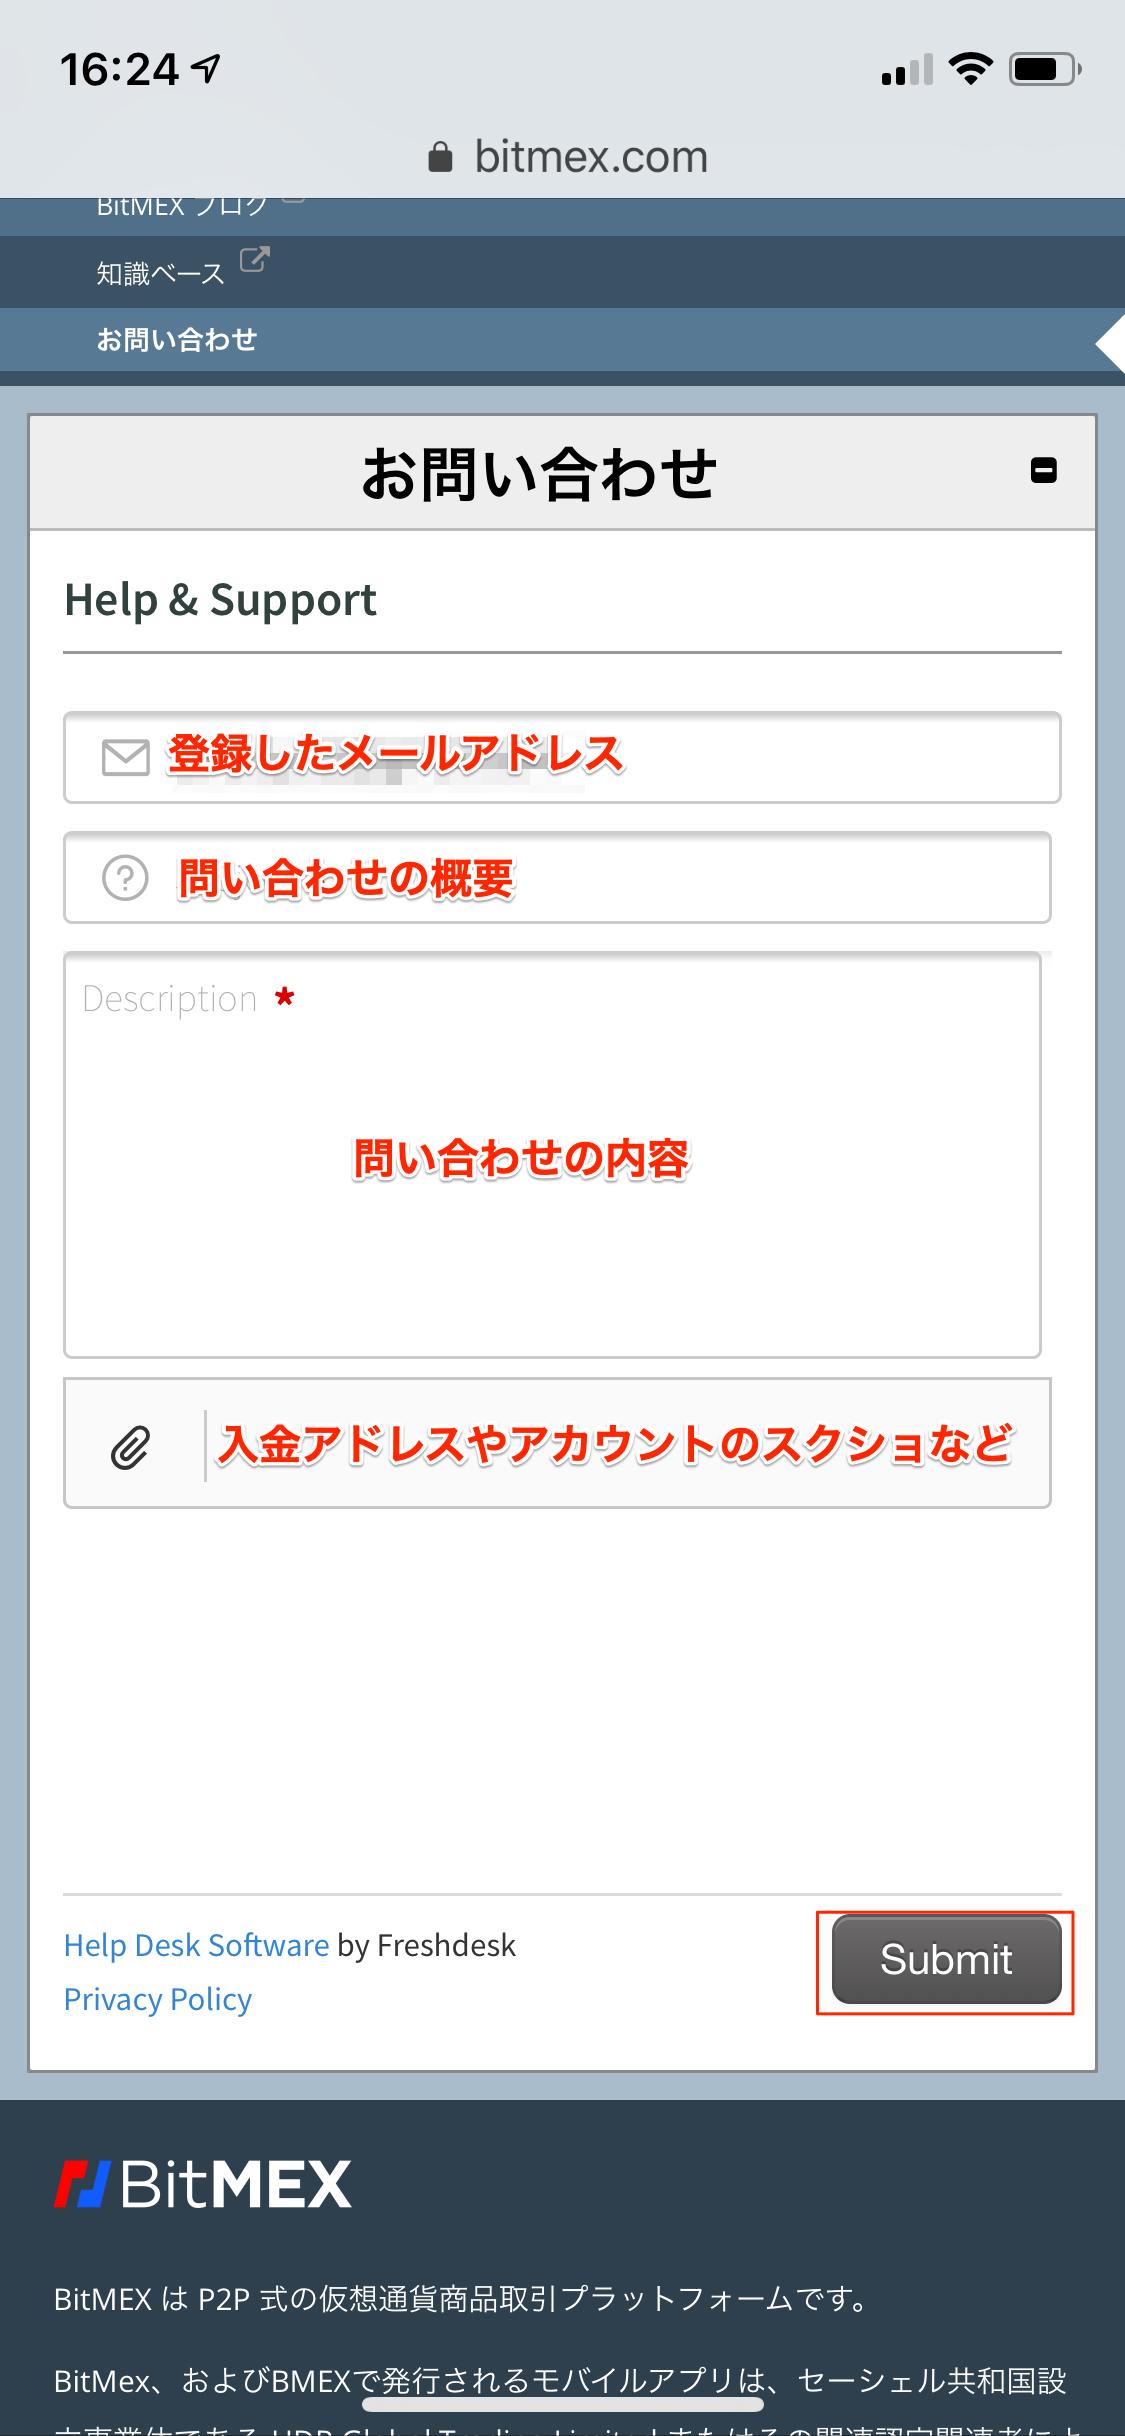 BitMEXのスマホ版お問い合わせ入力フォーム